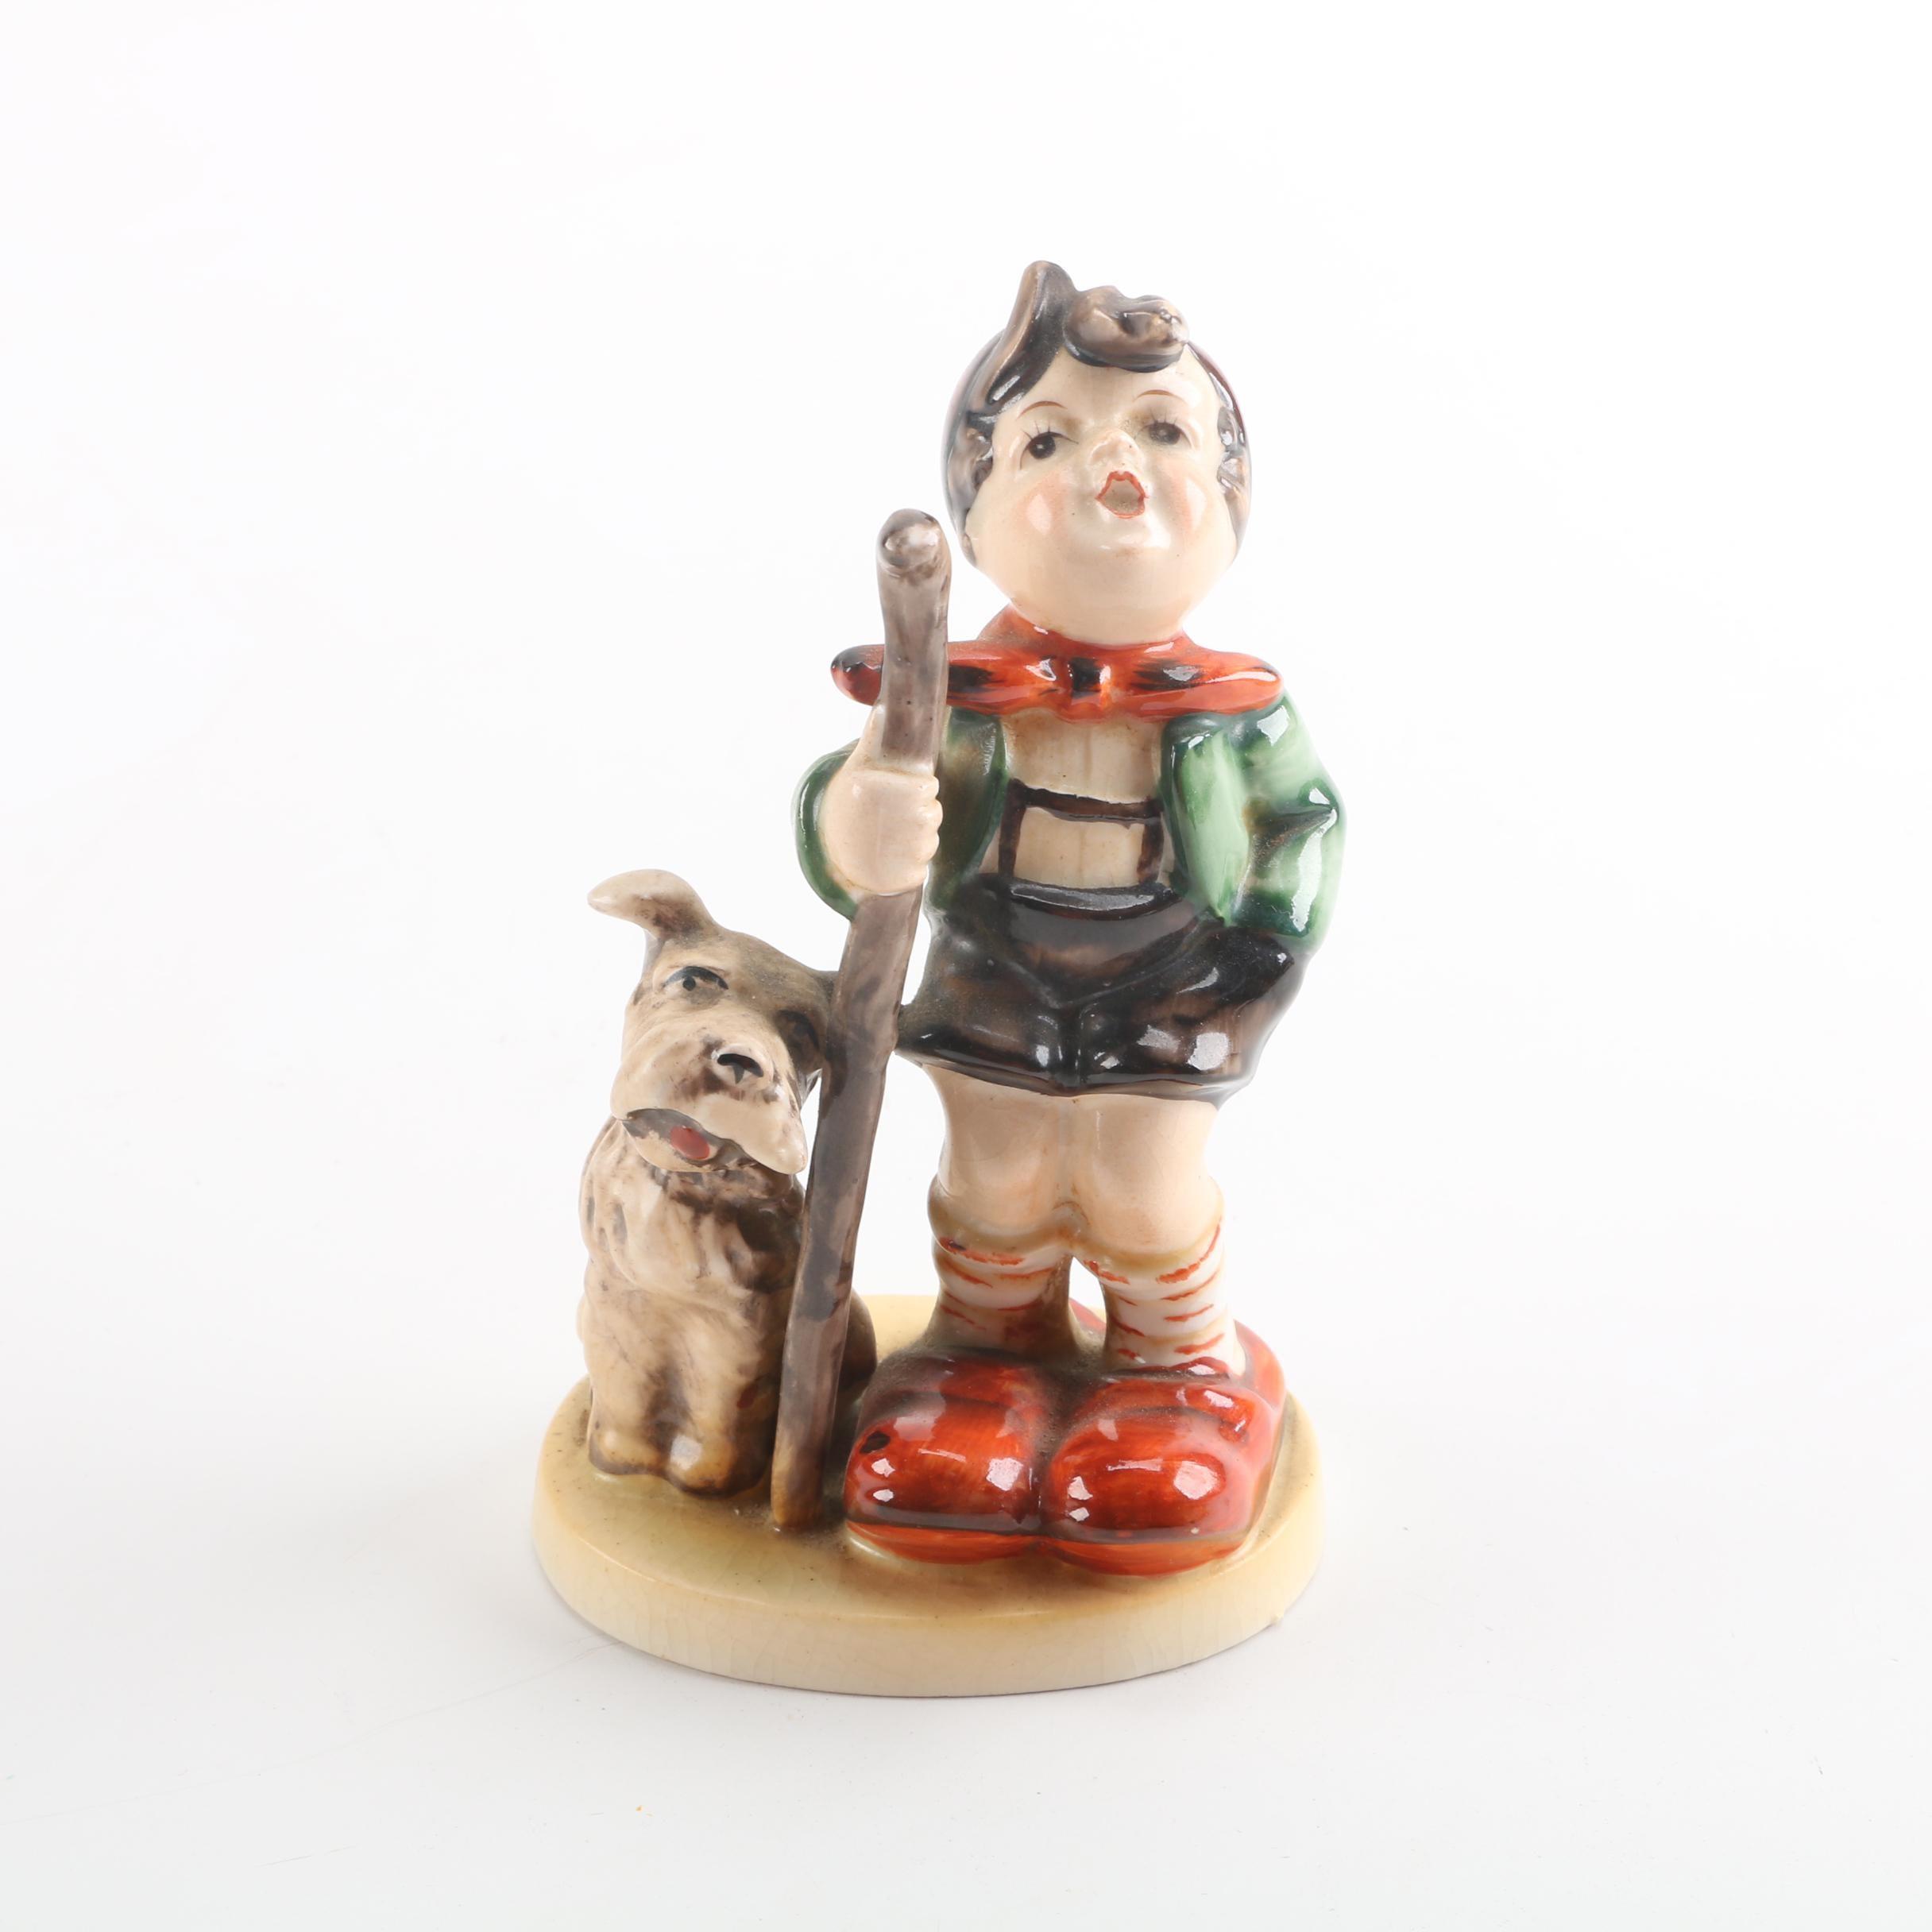 Maruyama Japanese Ceramic Figurine